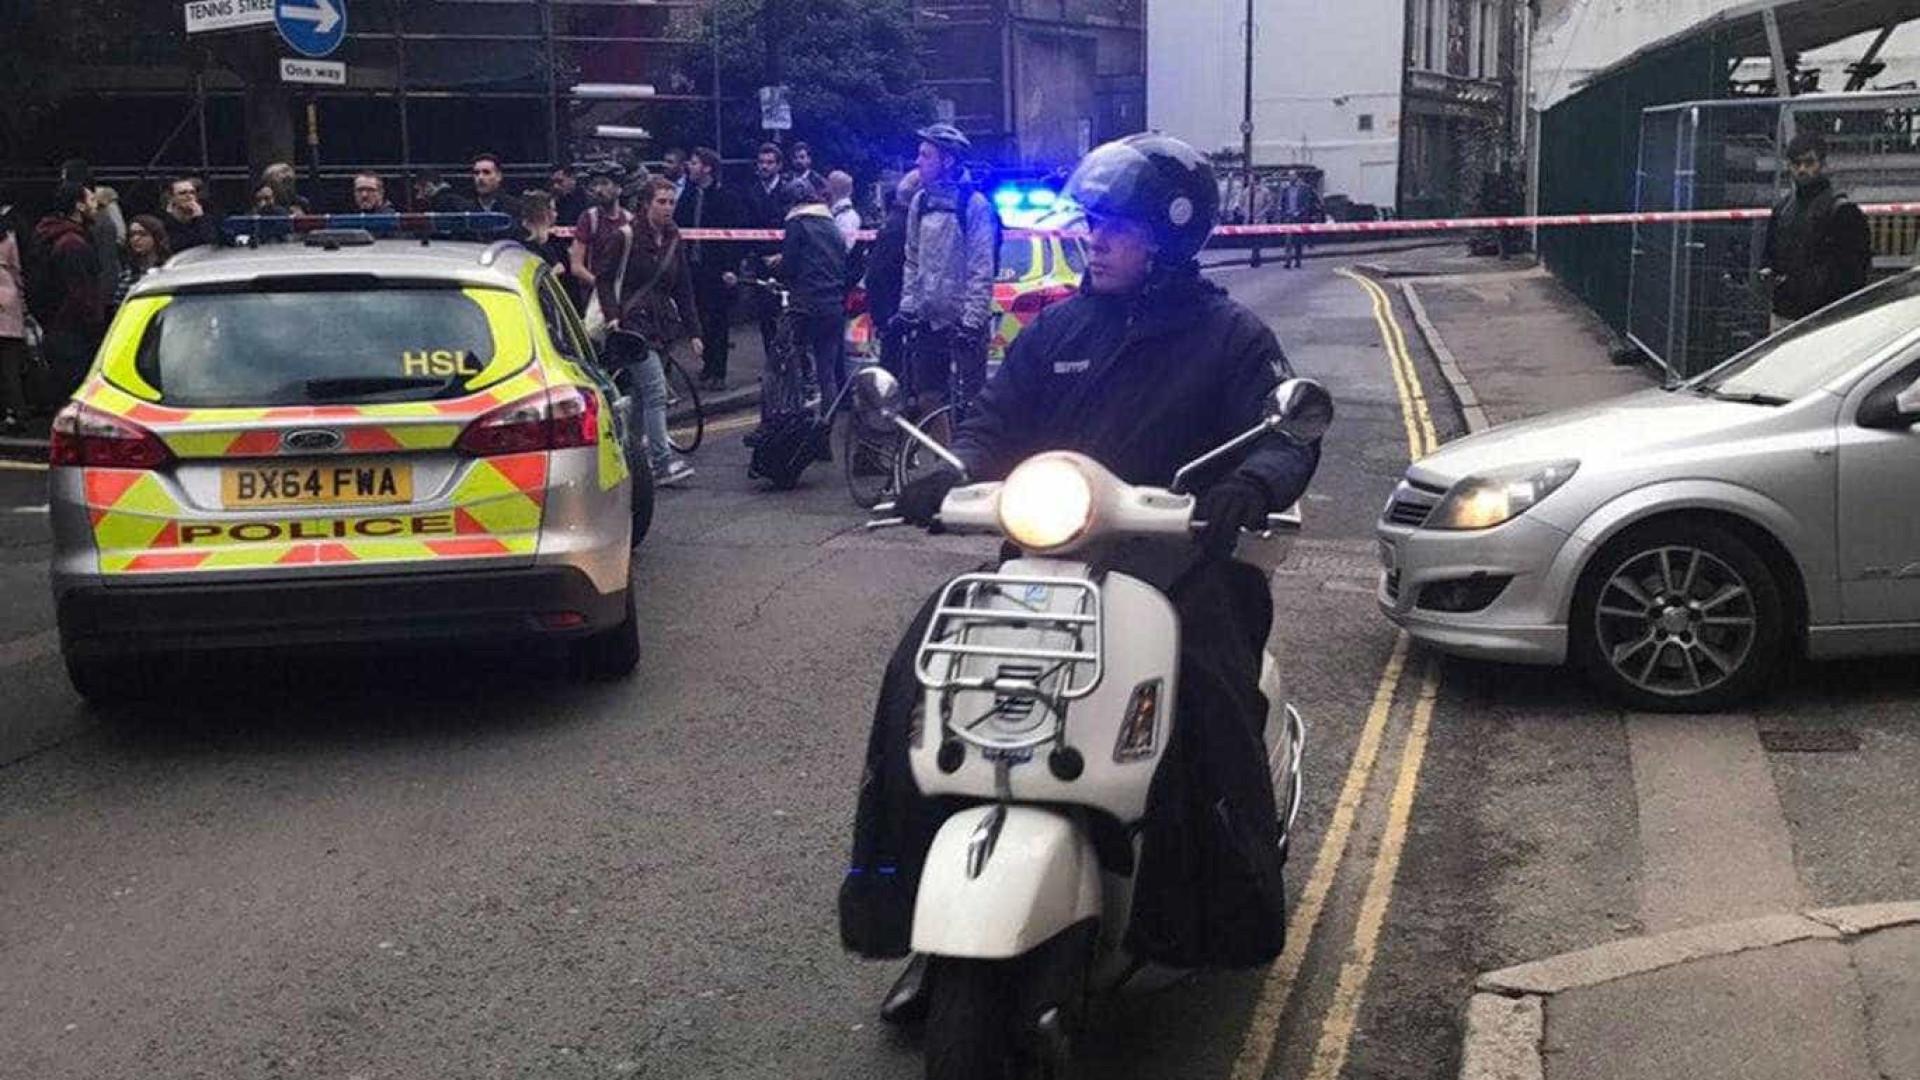 Estação de London Bridge evacuada. Veículo suspeito no local